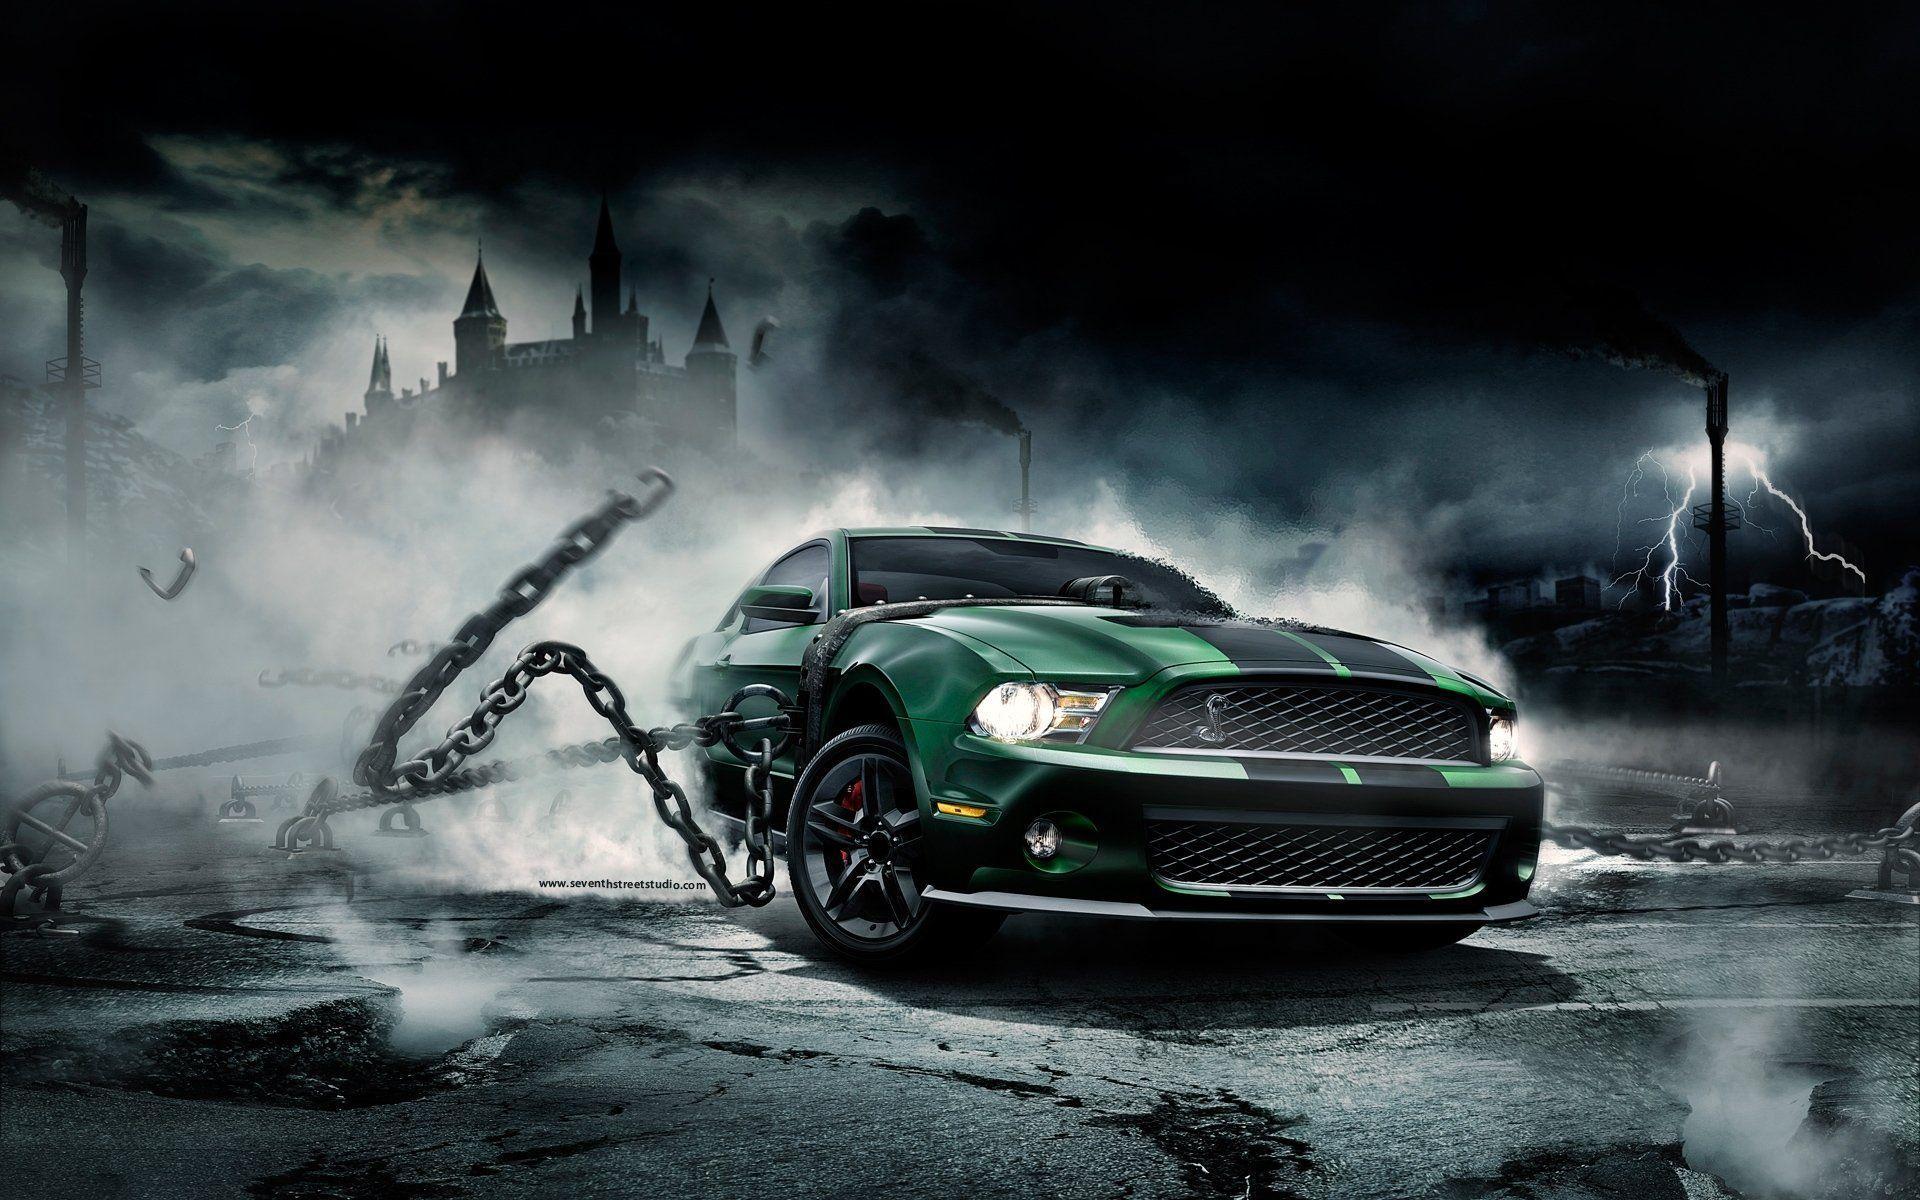 Mustang Car Wallpapers Top Free Mustang Car Backgrounds Wallpaperaccess